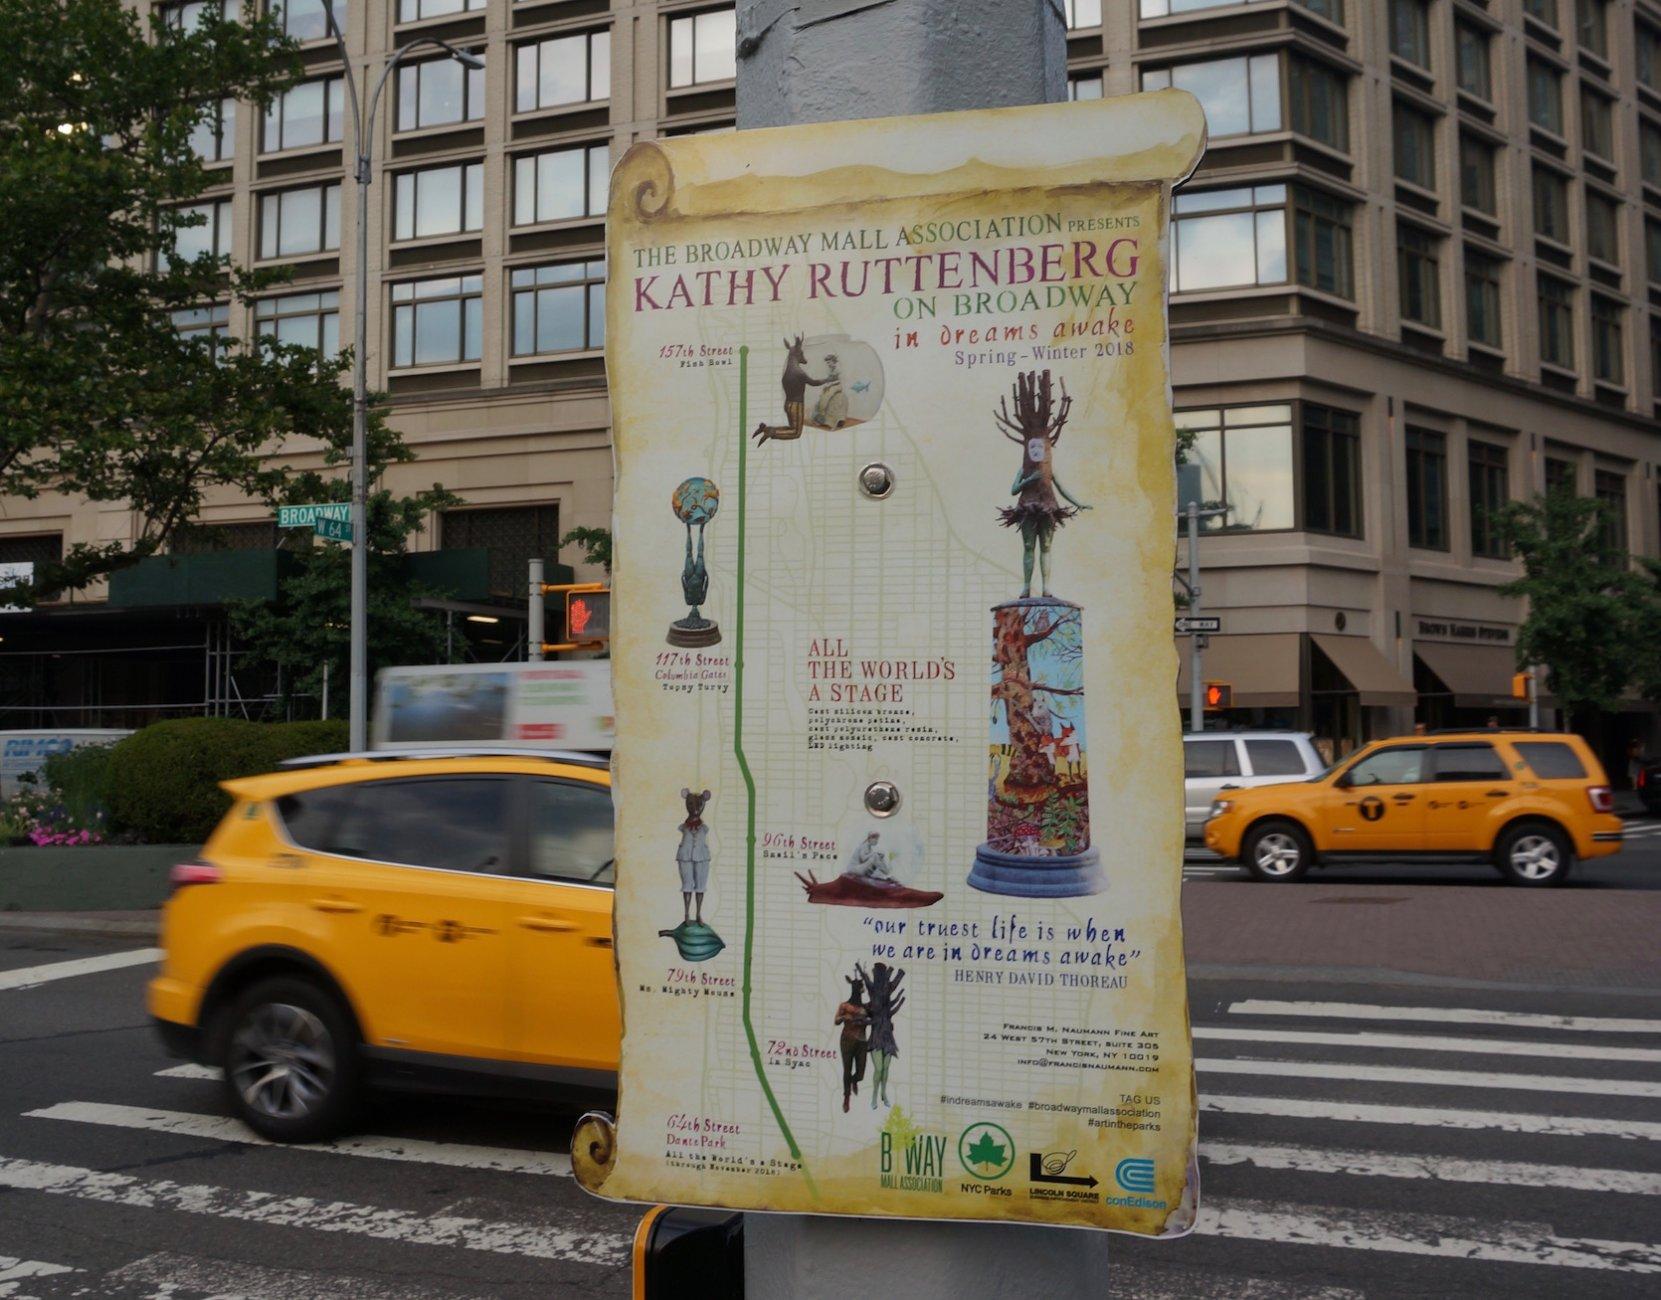 kathy-ruttemberg-broadway-nyc.jpg